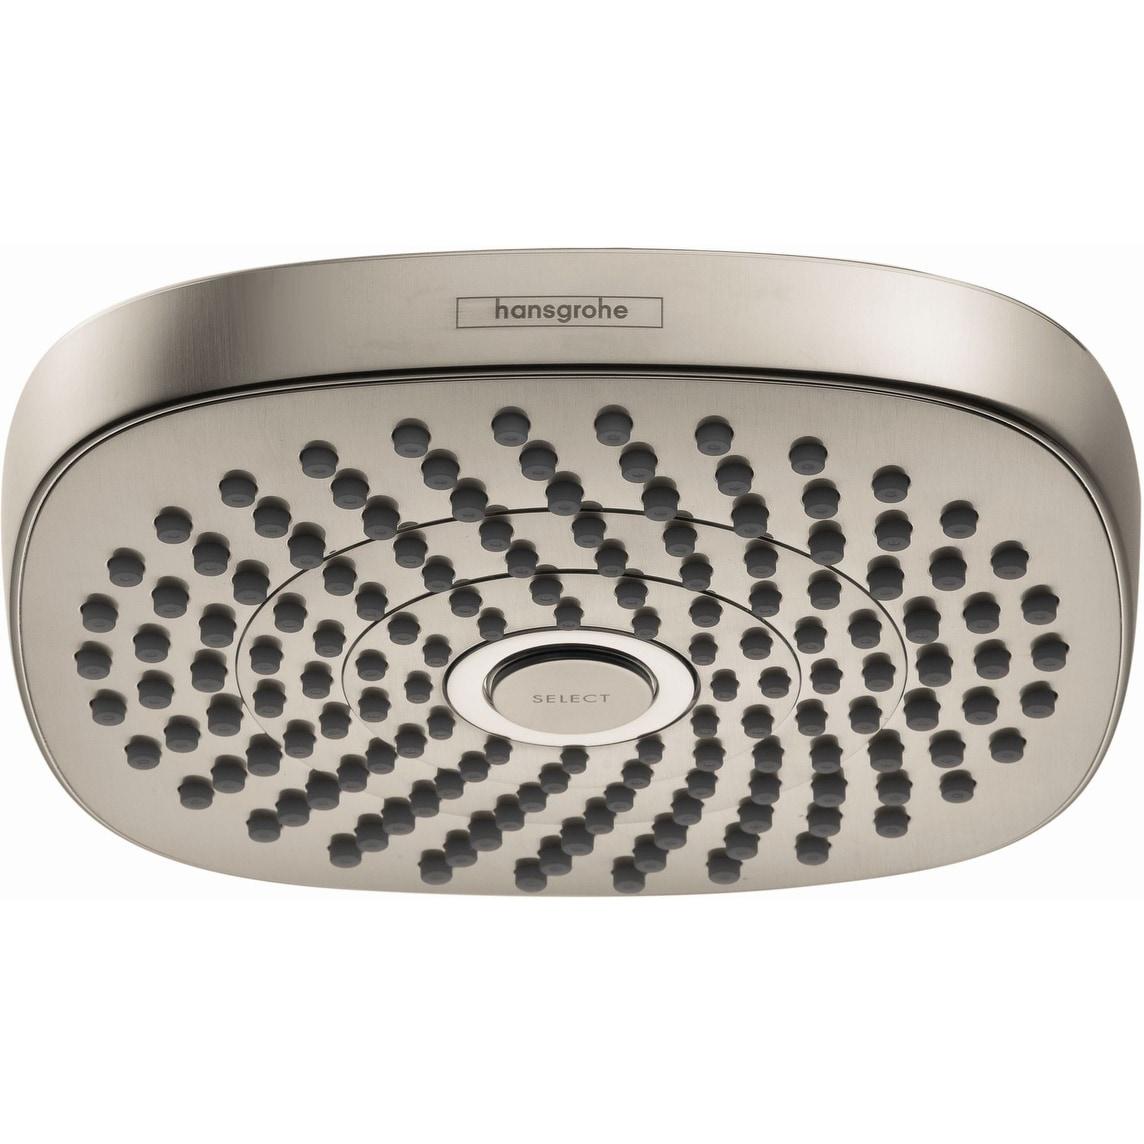 Hansgrohe 04387 Croma 1 8 Gpm Multi Function Rain Square Shower Head